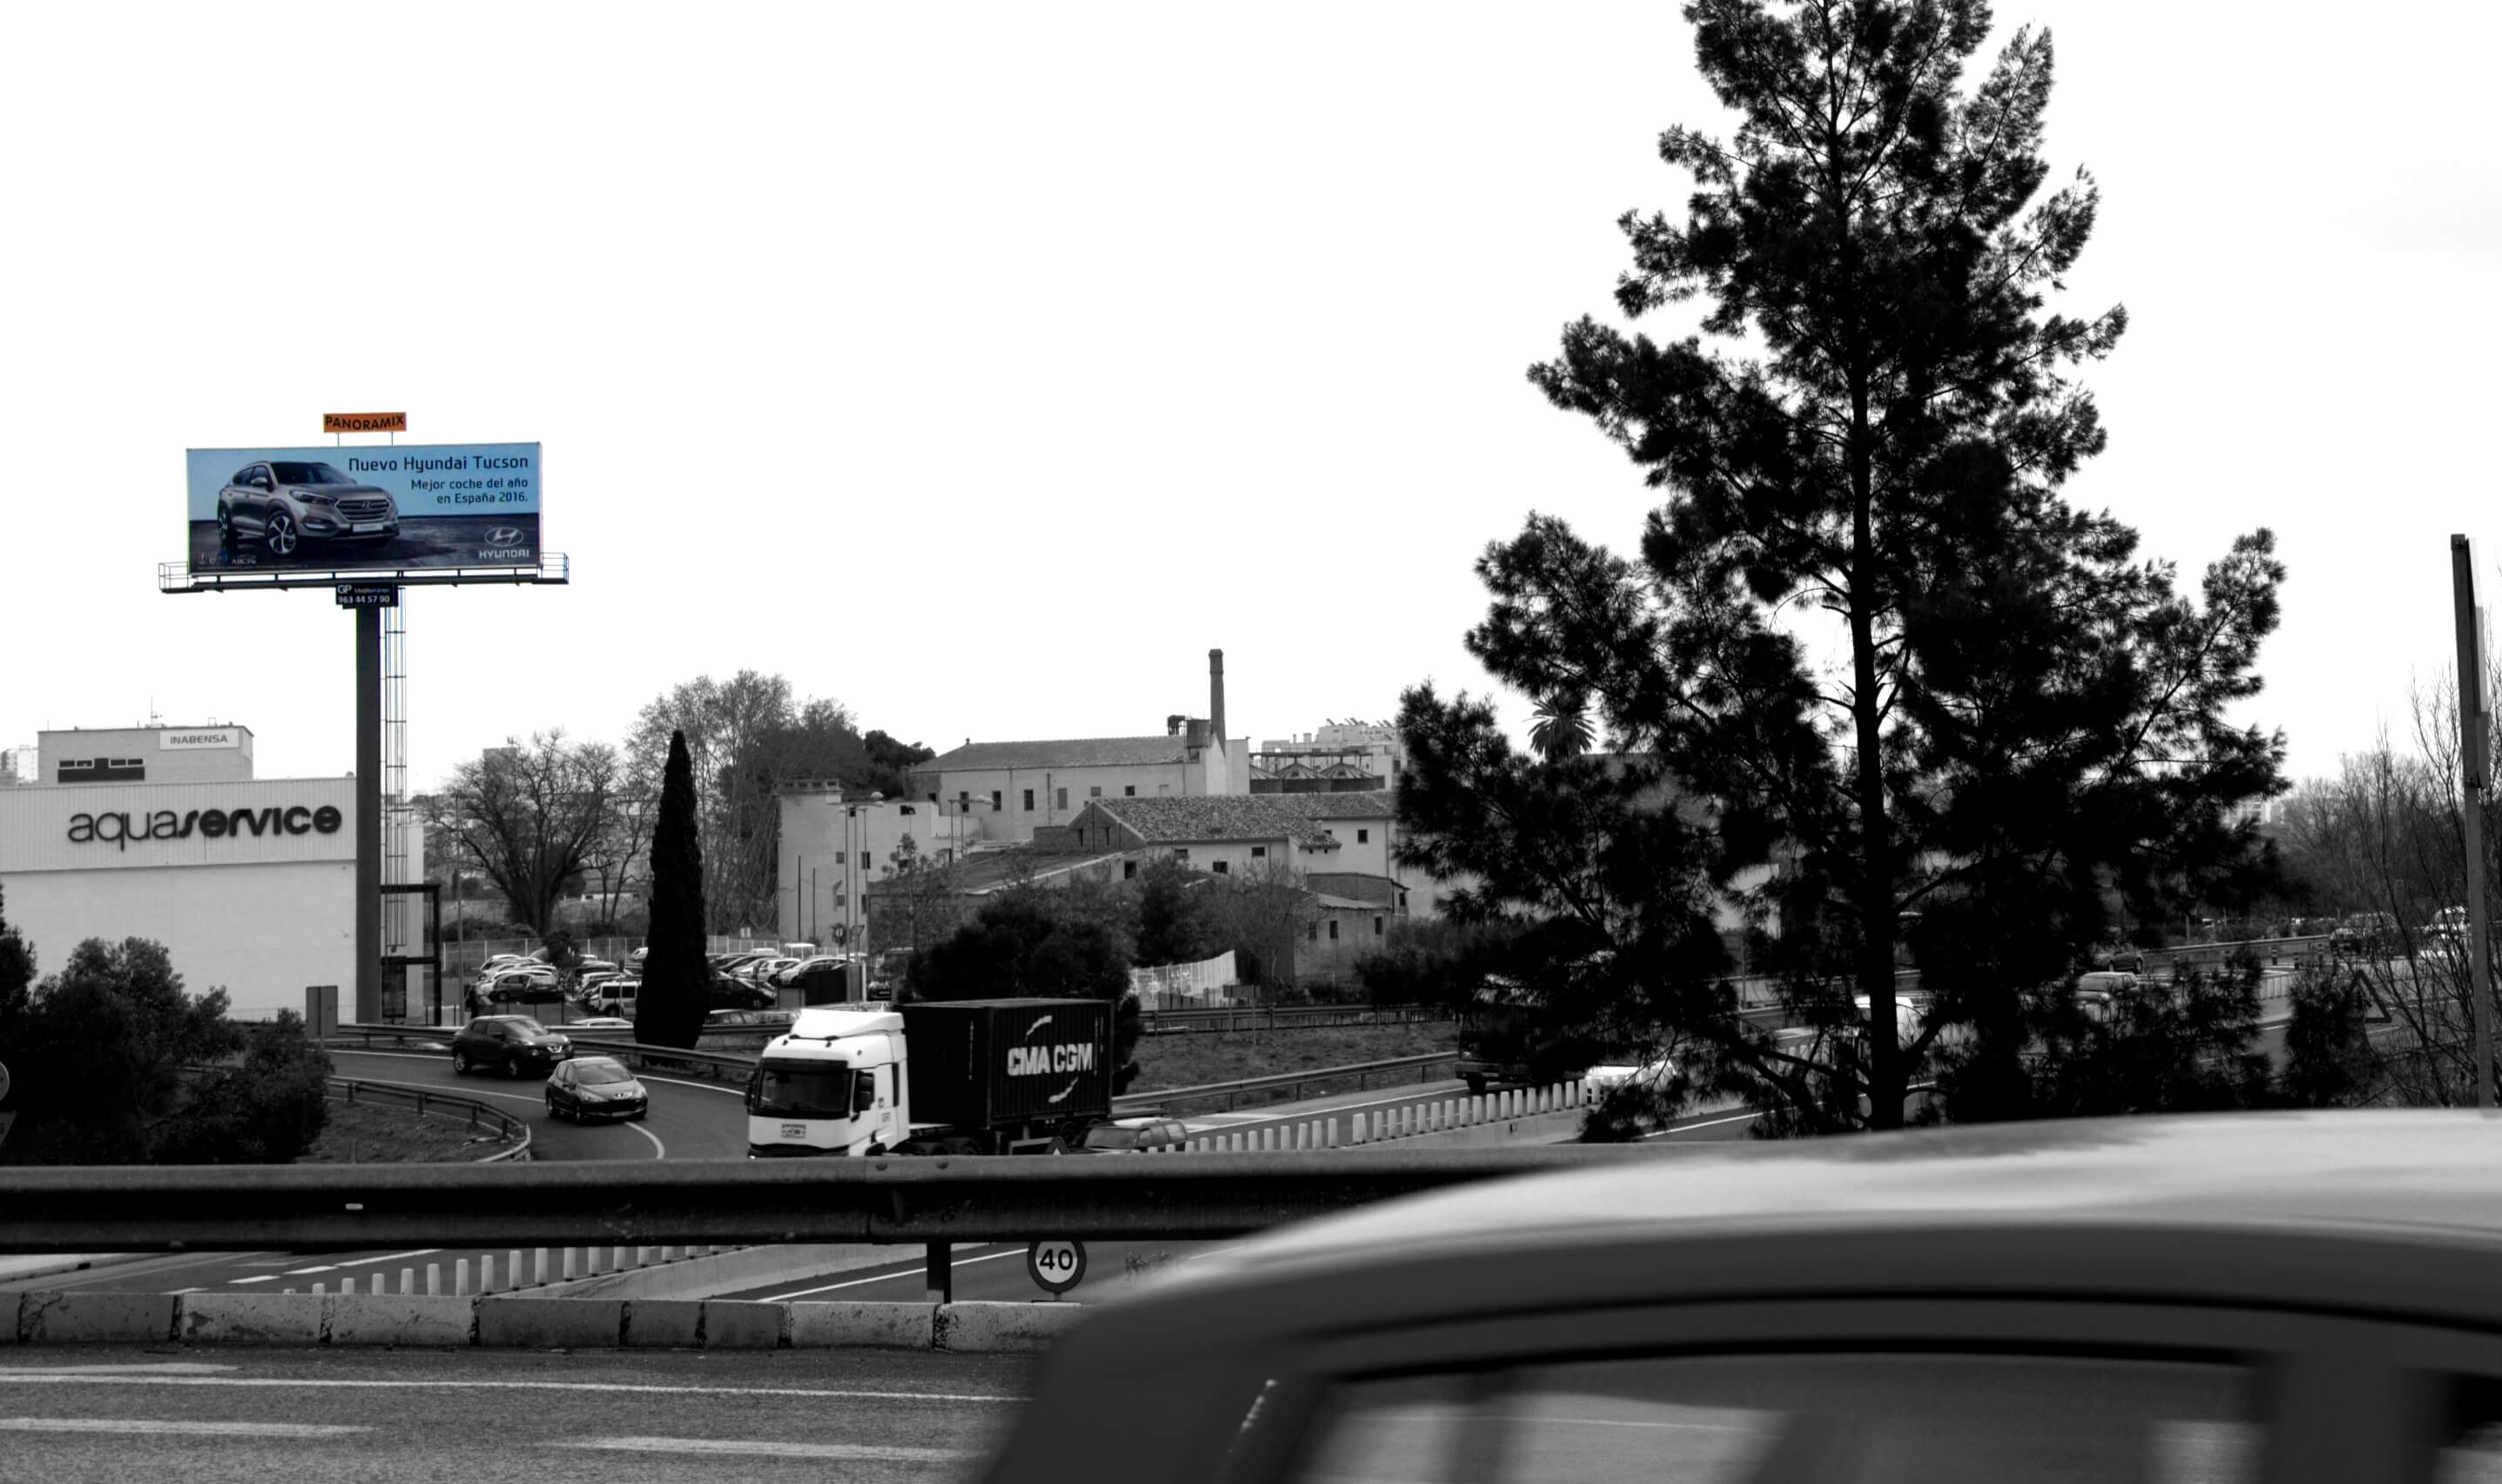 Monoposte Gp Mediterráneo Hyundai